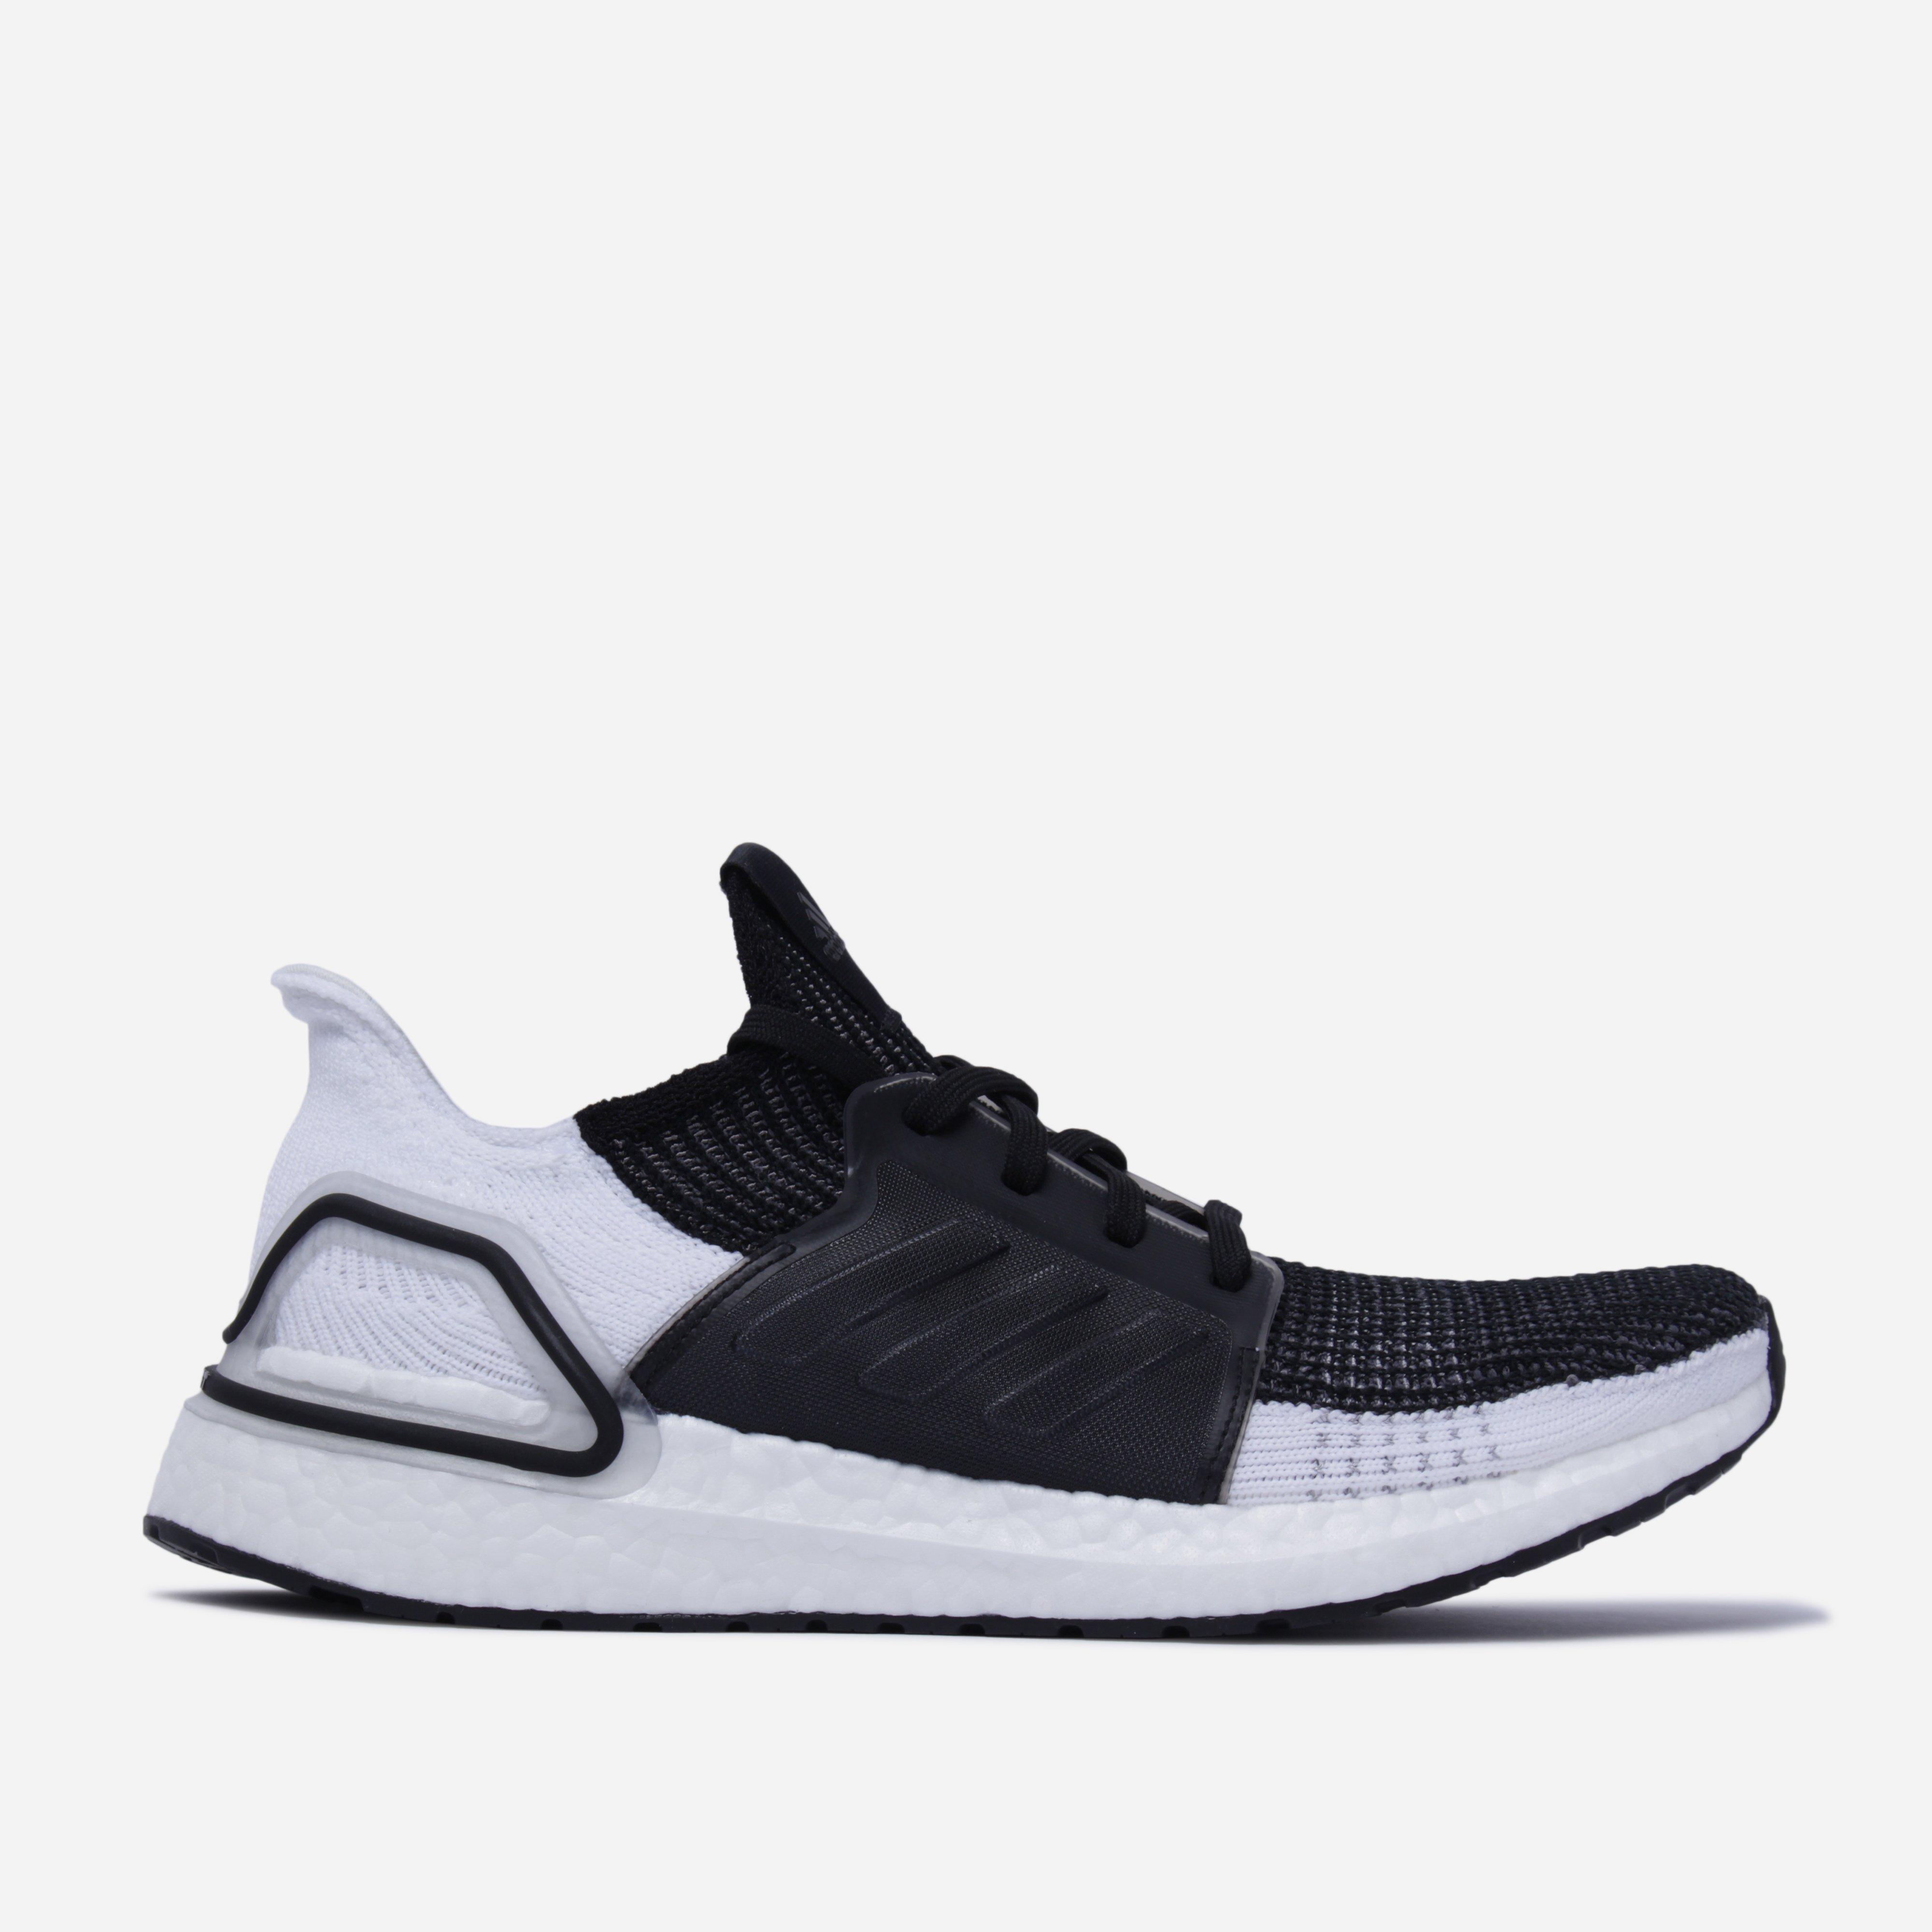 0790a7097 Adidas - Black Ultraboost 19 for Men - Lyst. View fullscreen